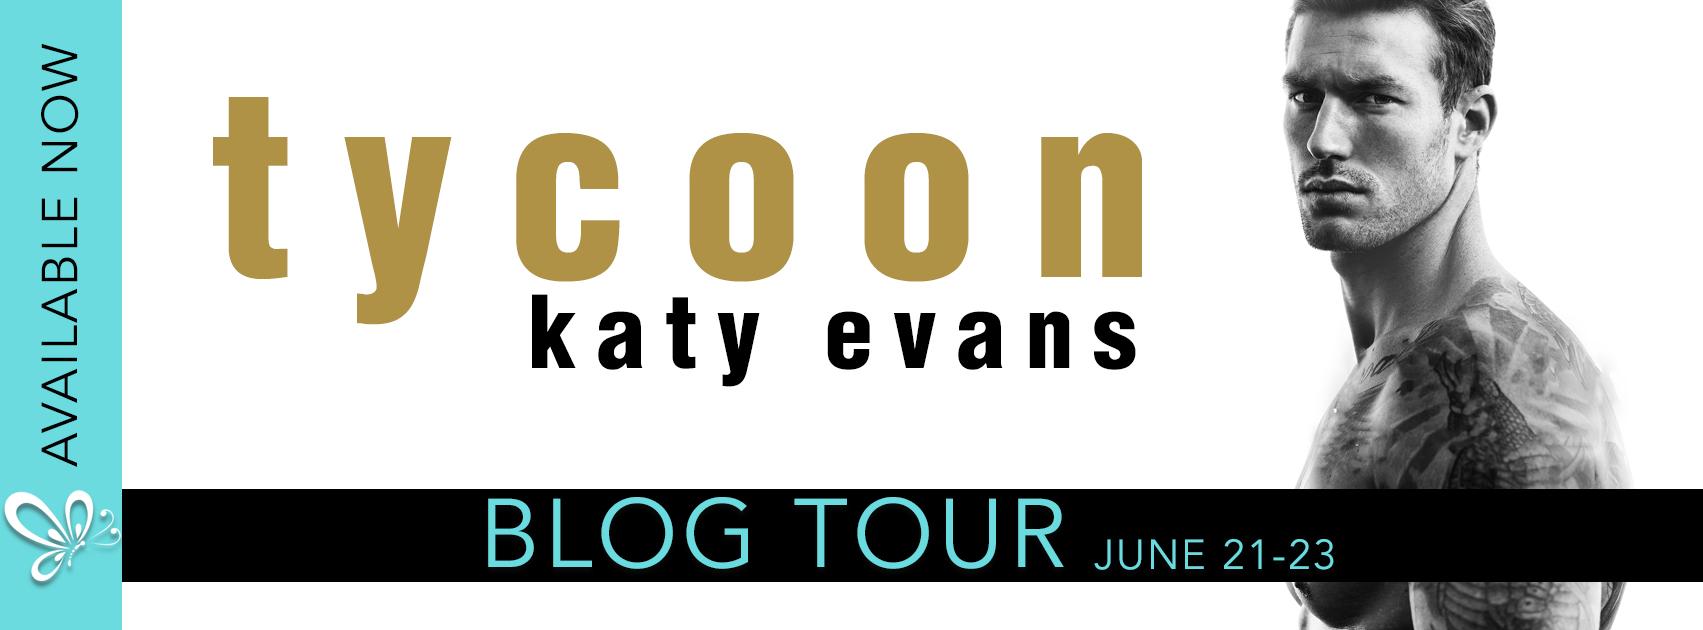 www.dgbookblog.com-tycoon-katy.evans.BT